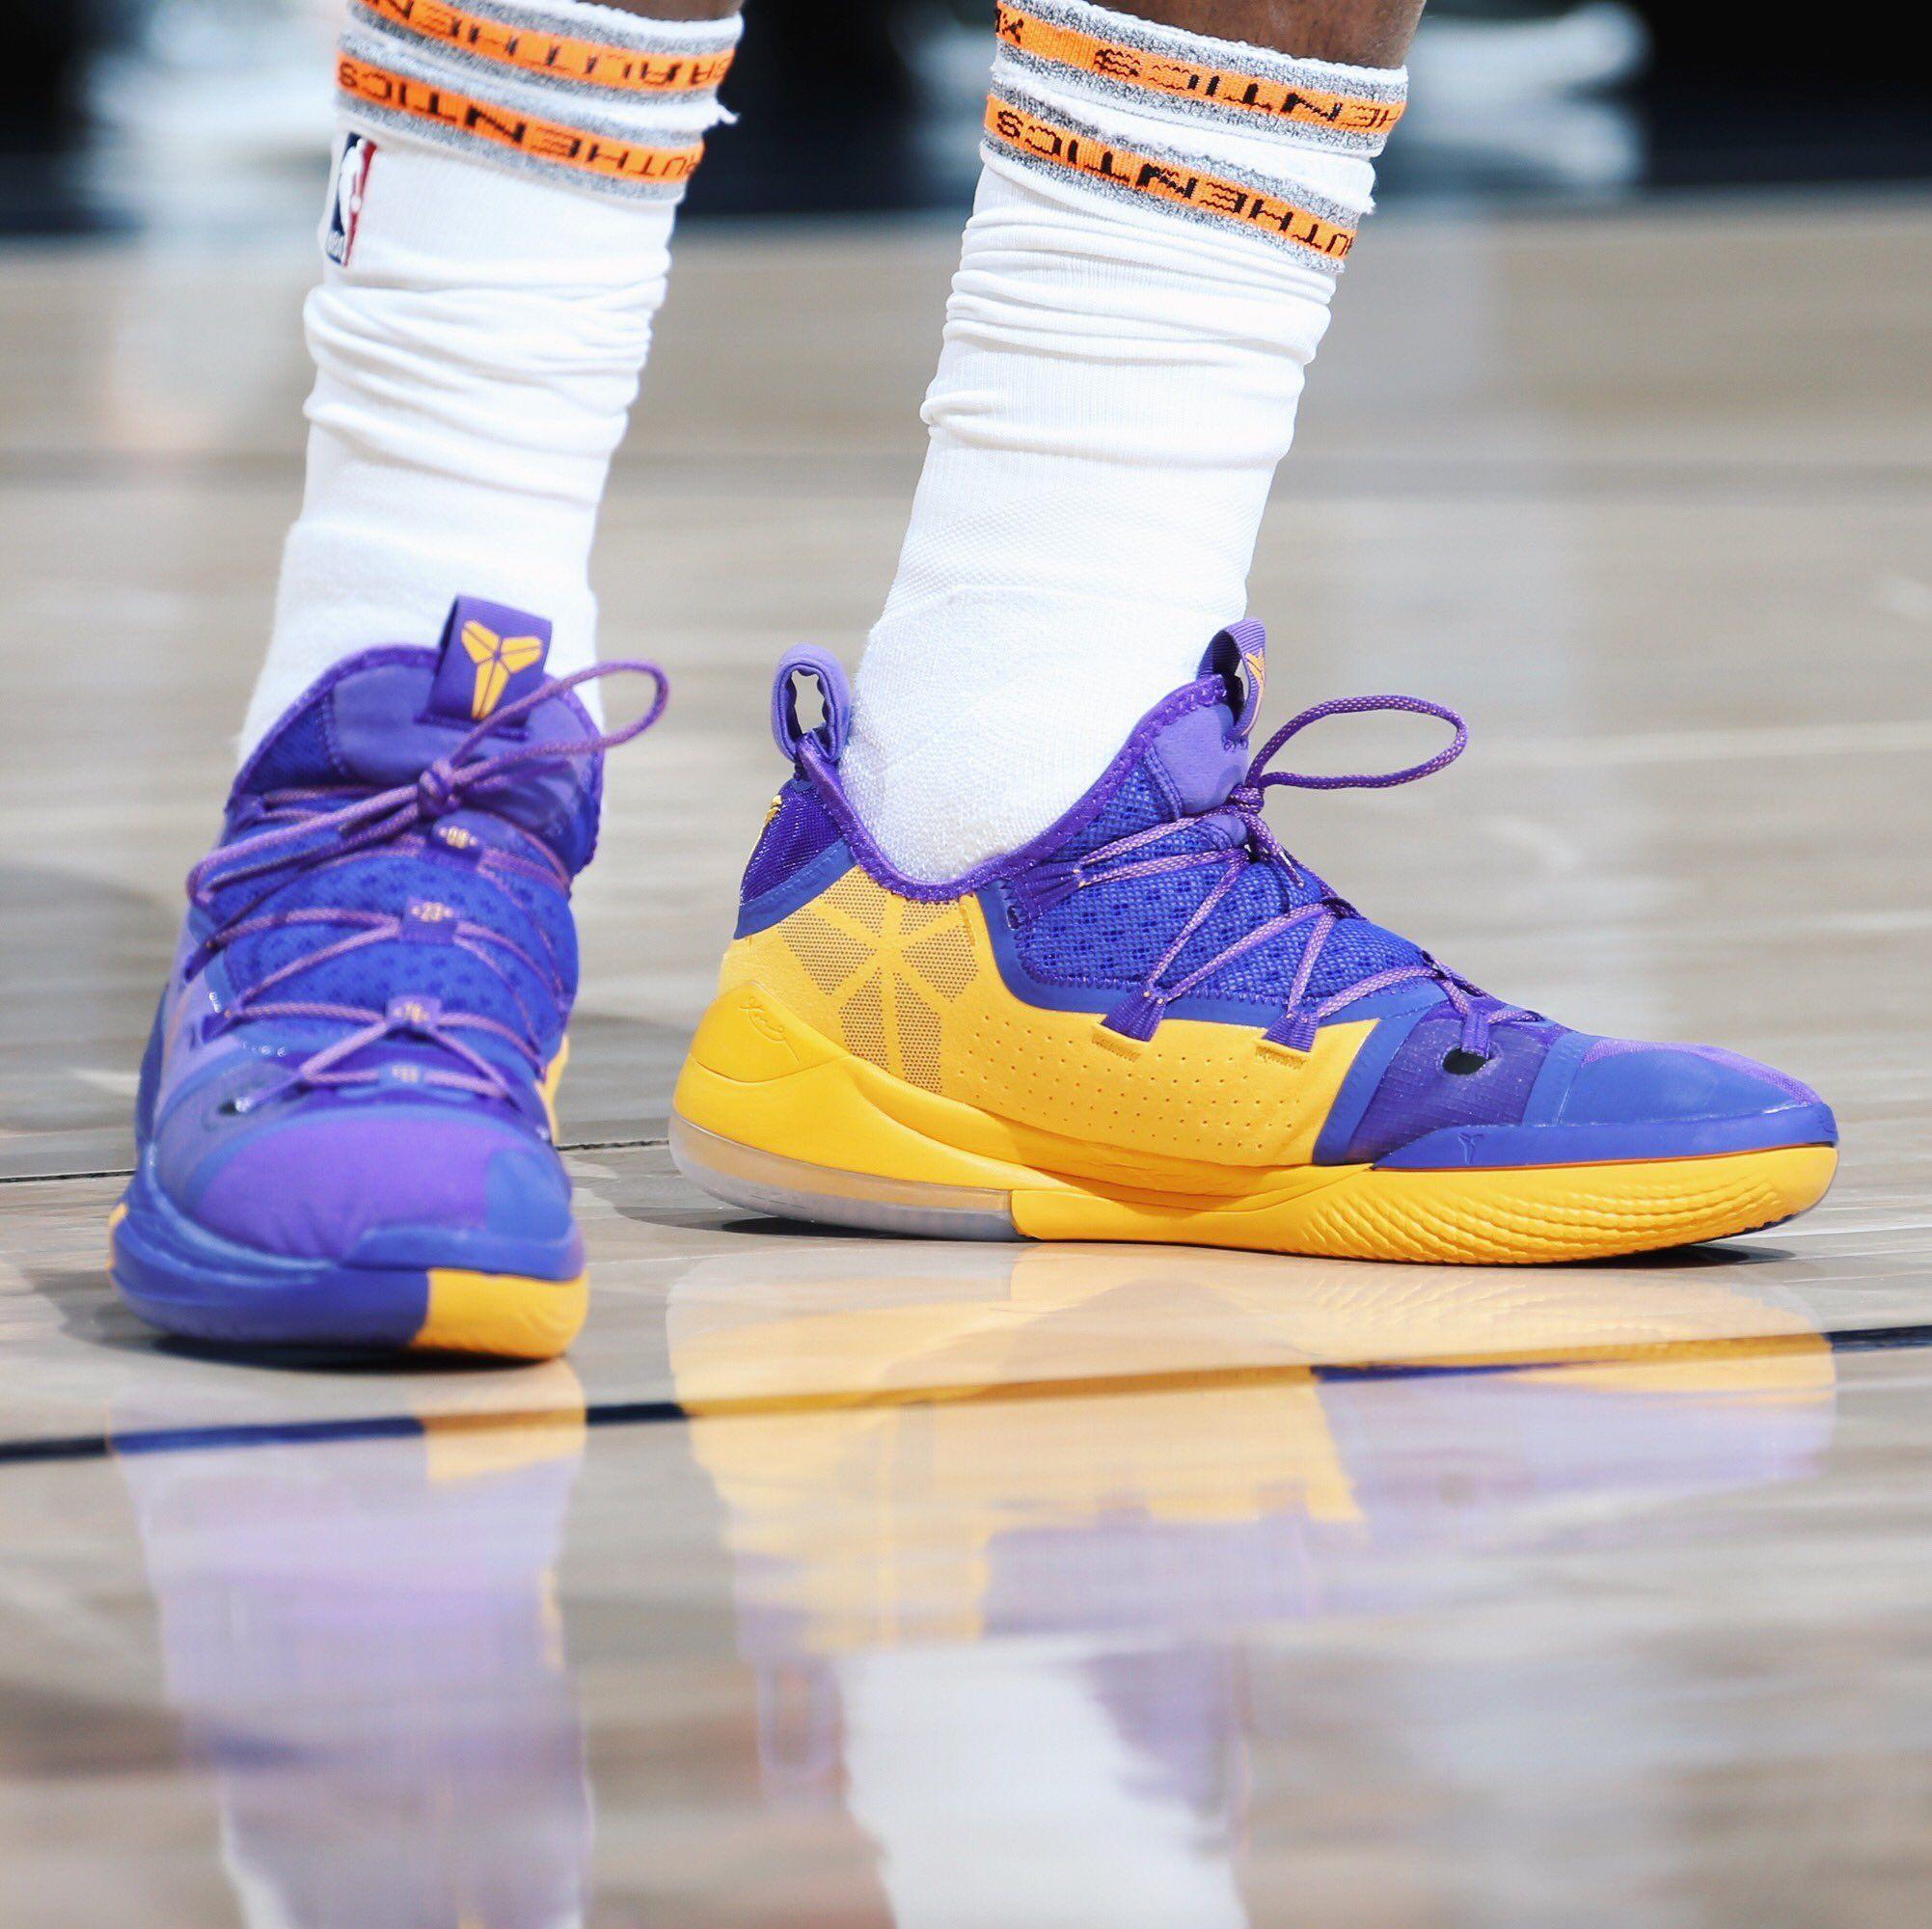 info for 8e420 3adc1 Utah Jazz (18-19) Jae Crowder Nike Kobe A.D. Exodus PE